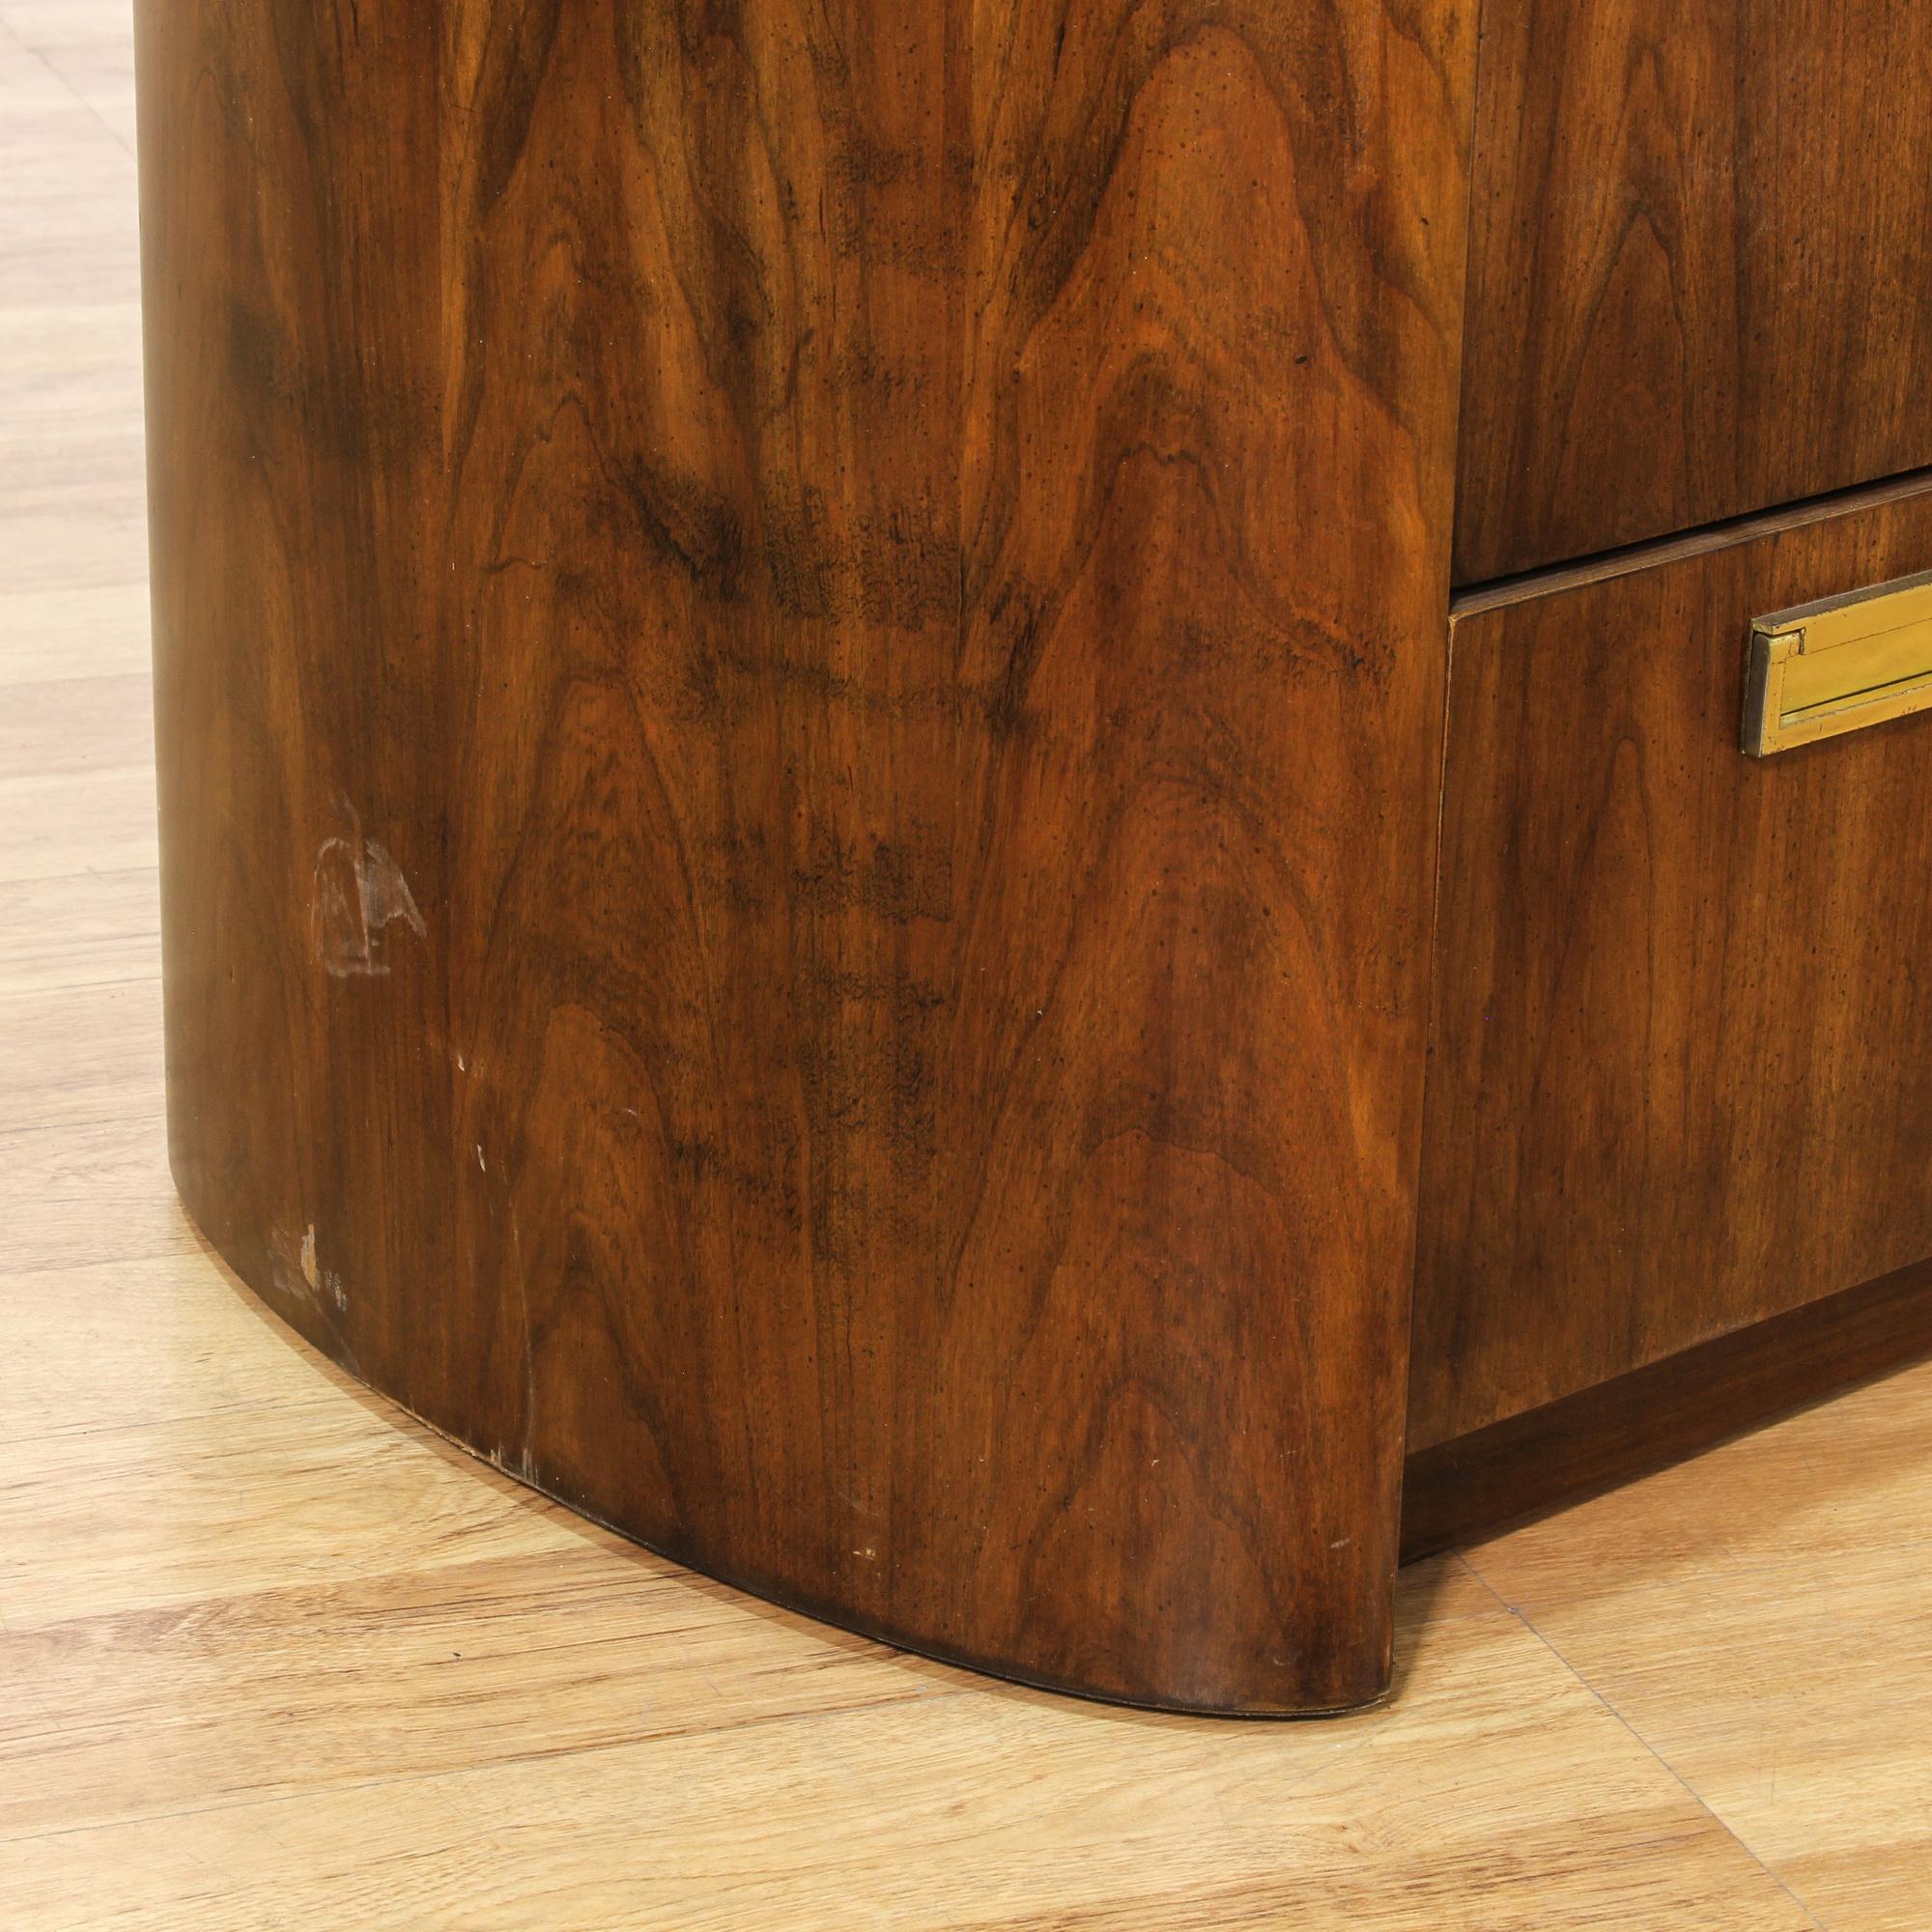 Quot Thomasville Quot Walnut Stained 7 Drawer Dresser Loveseat